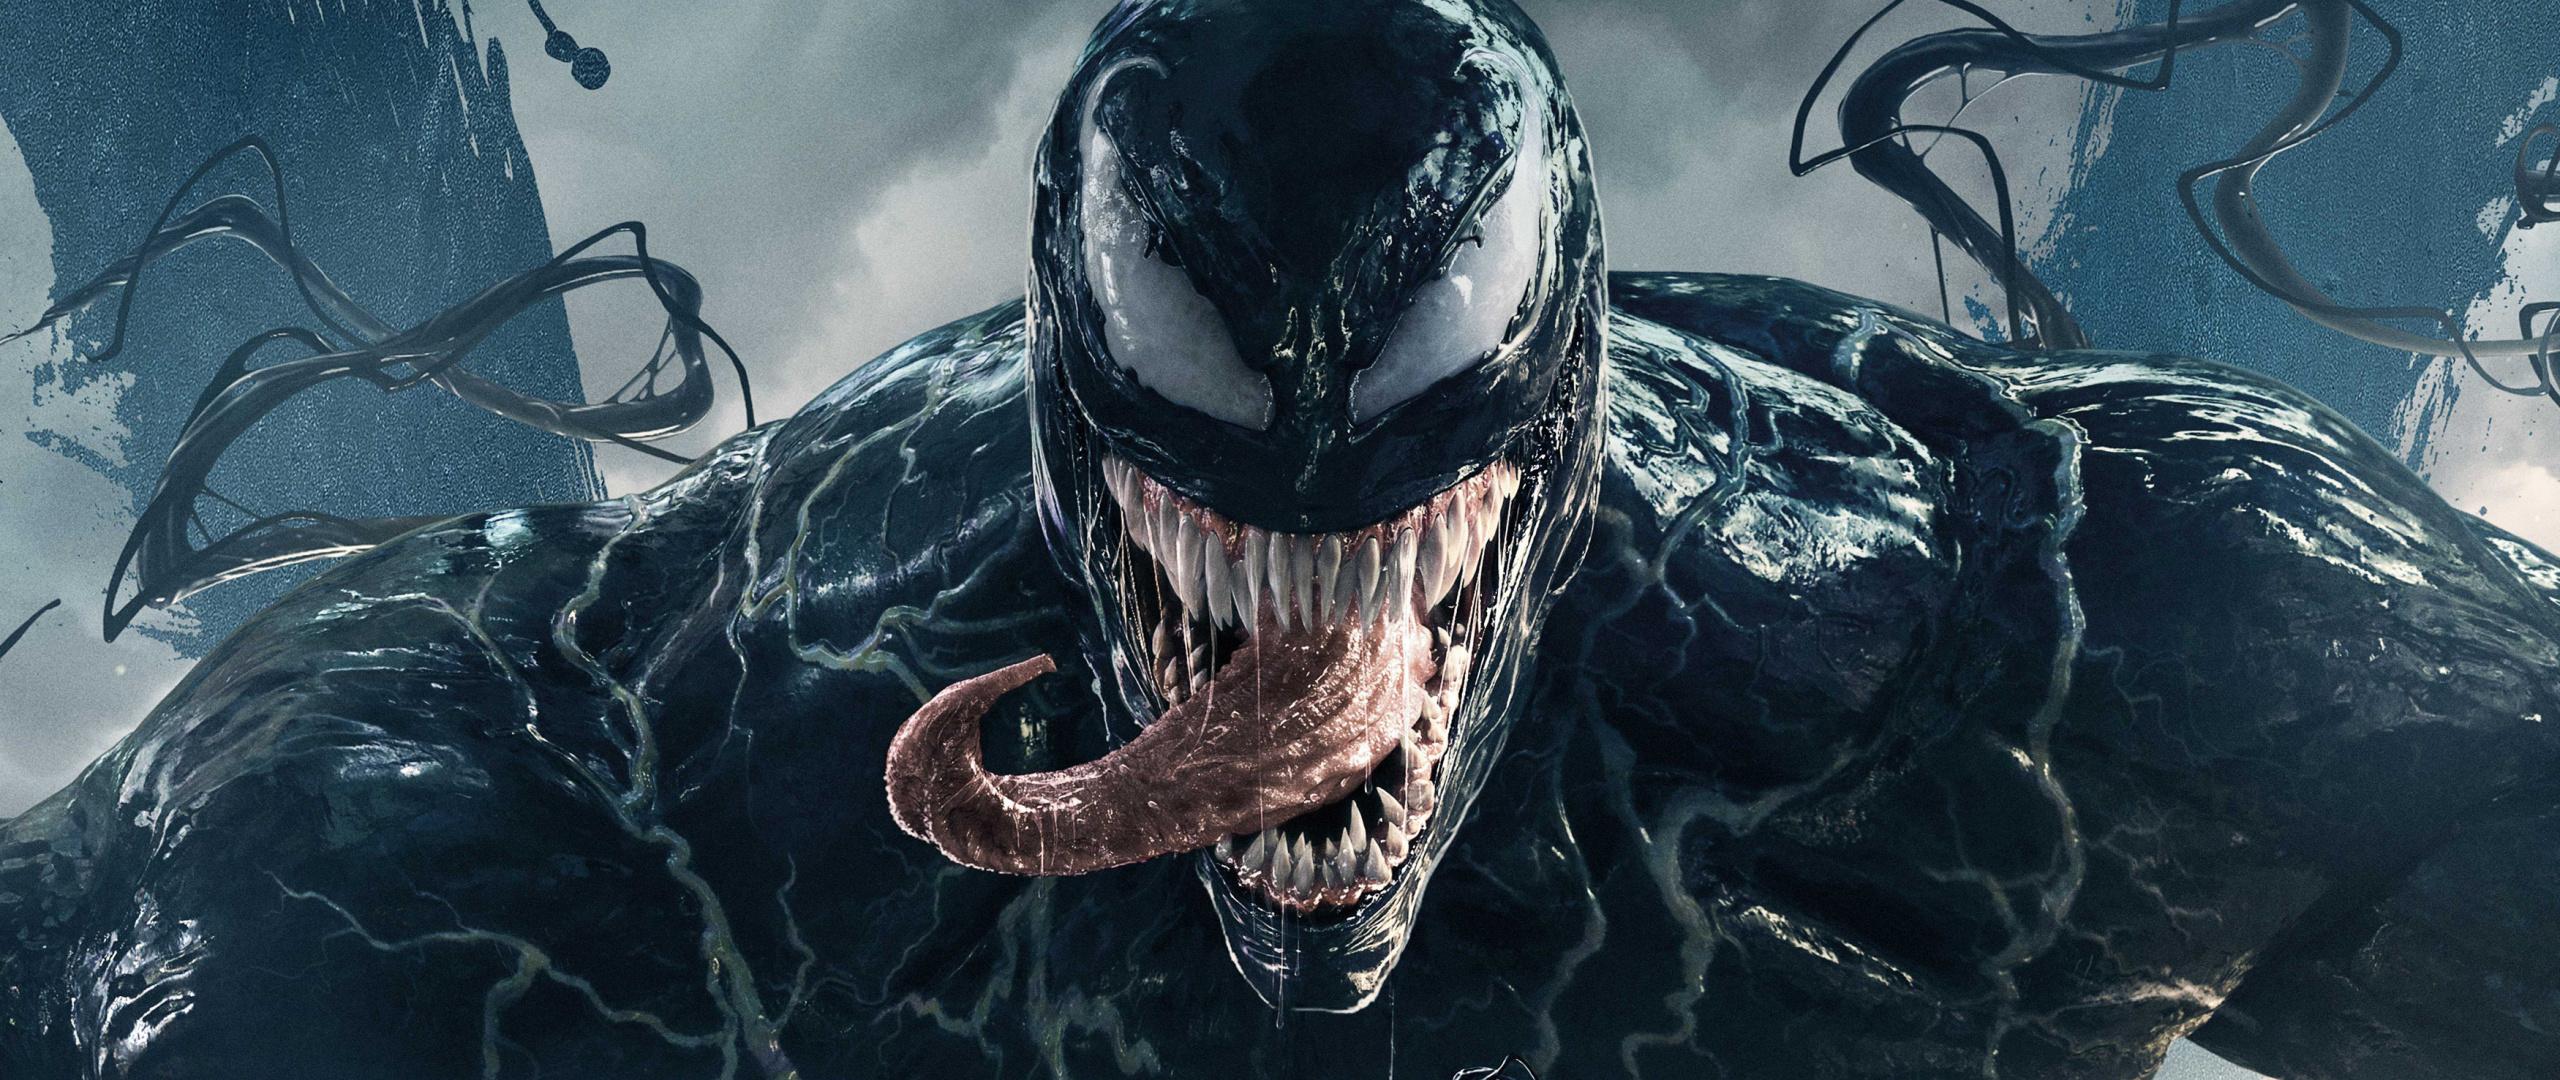 2018-movie-villain-venom